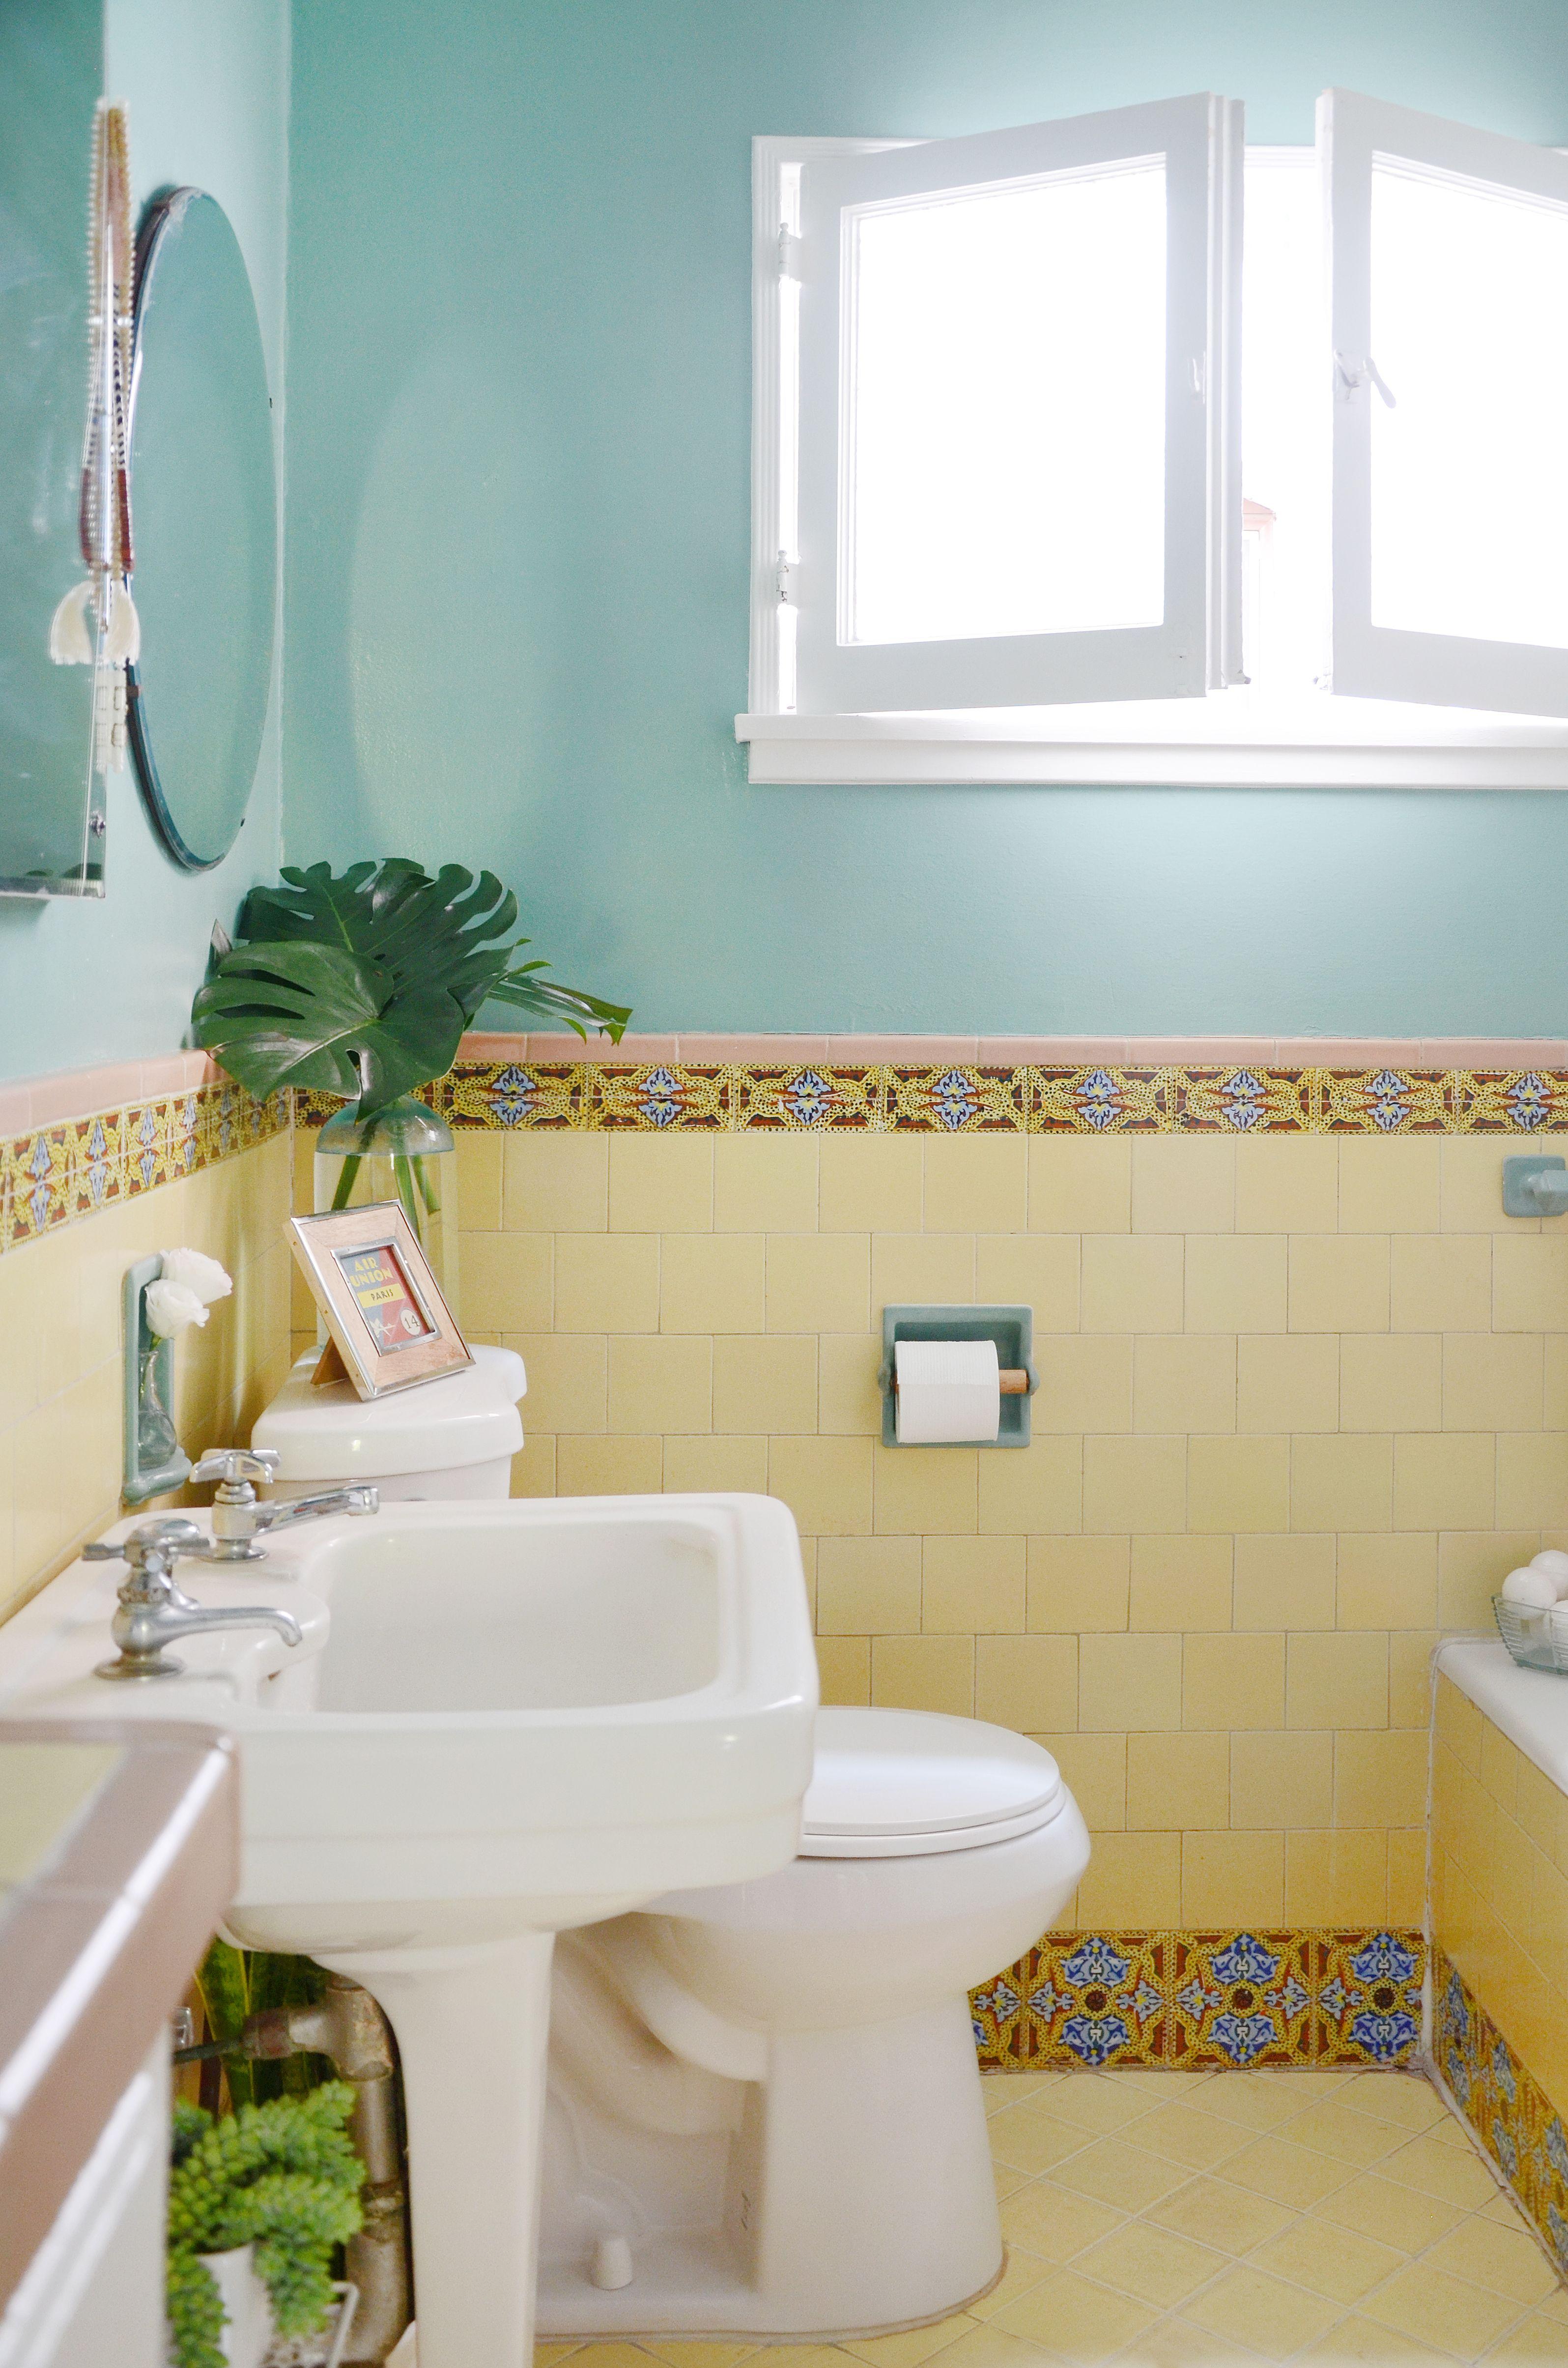 25 Genius Design & Storage Ideas for Your Small Bathroom | Small ...